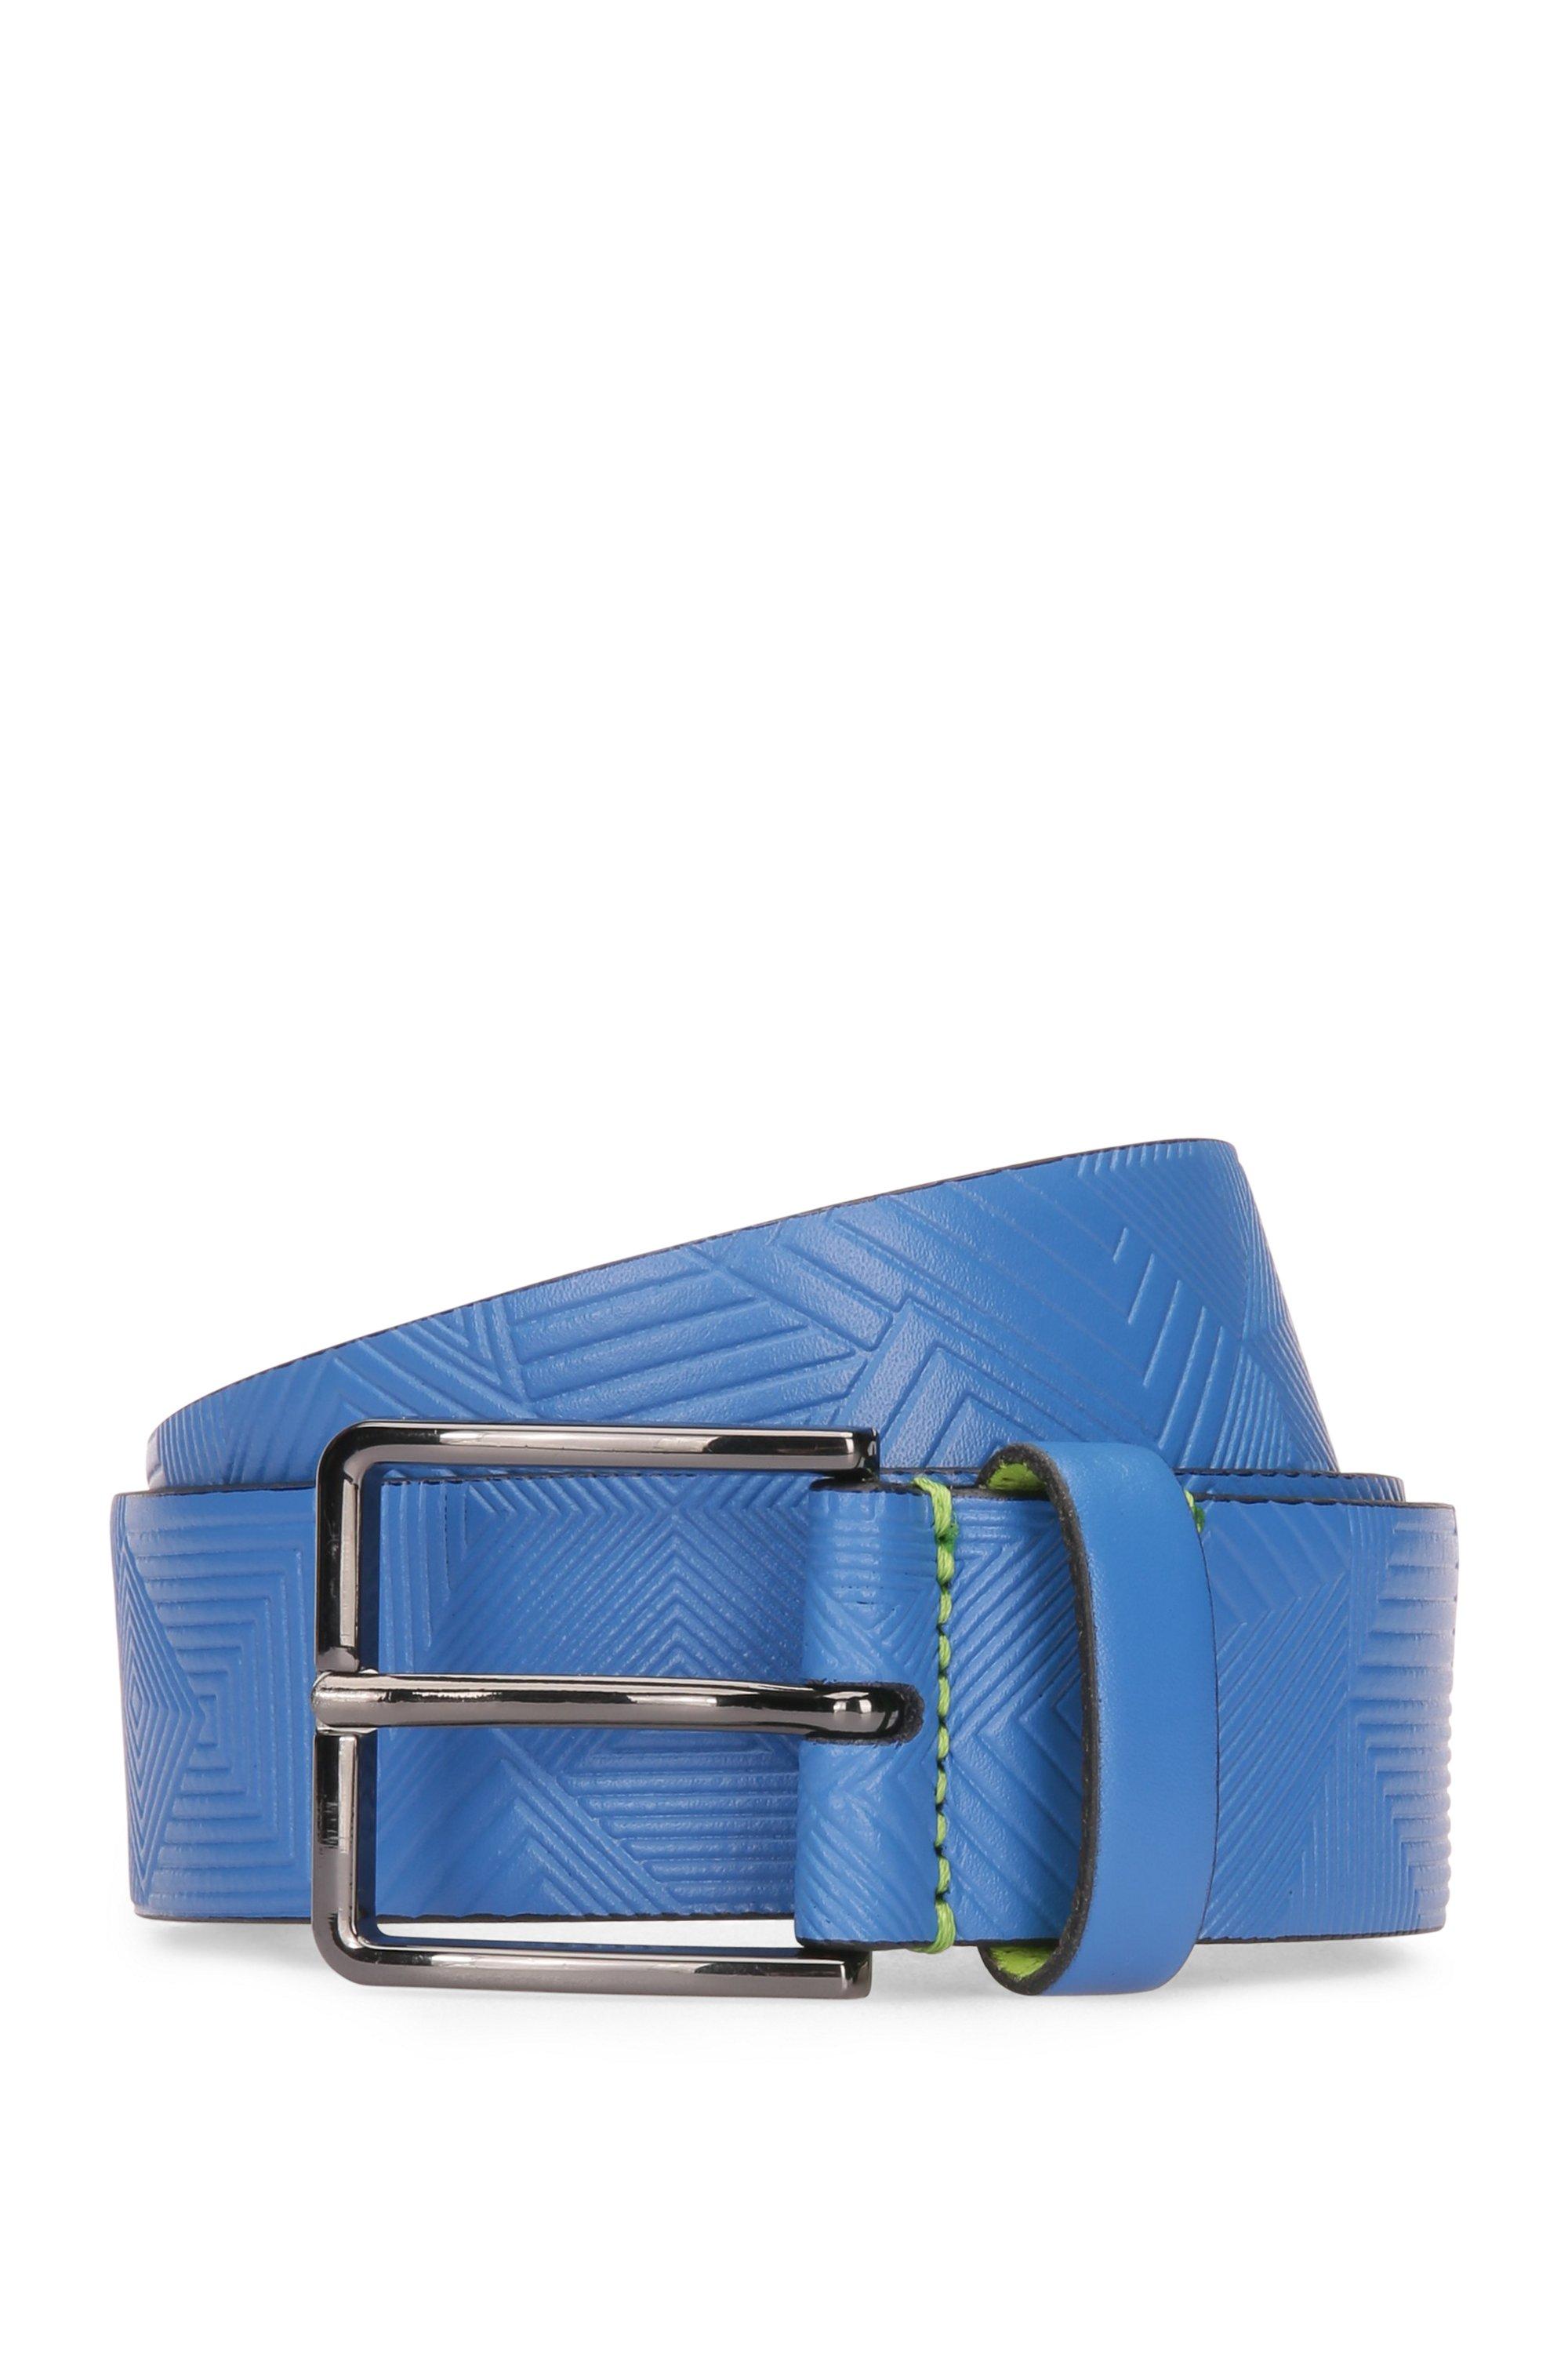 Ledergürtel mit geprägtem Muster, Blau